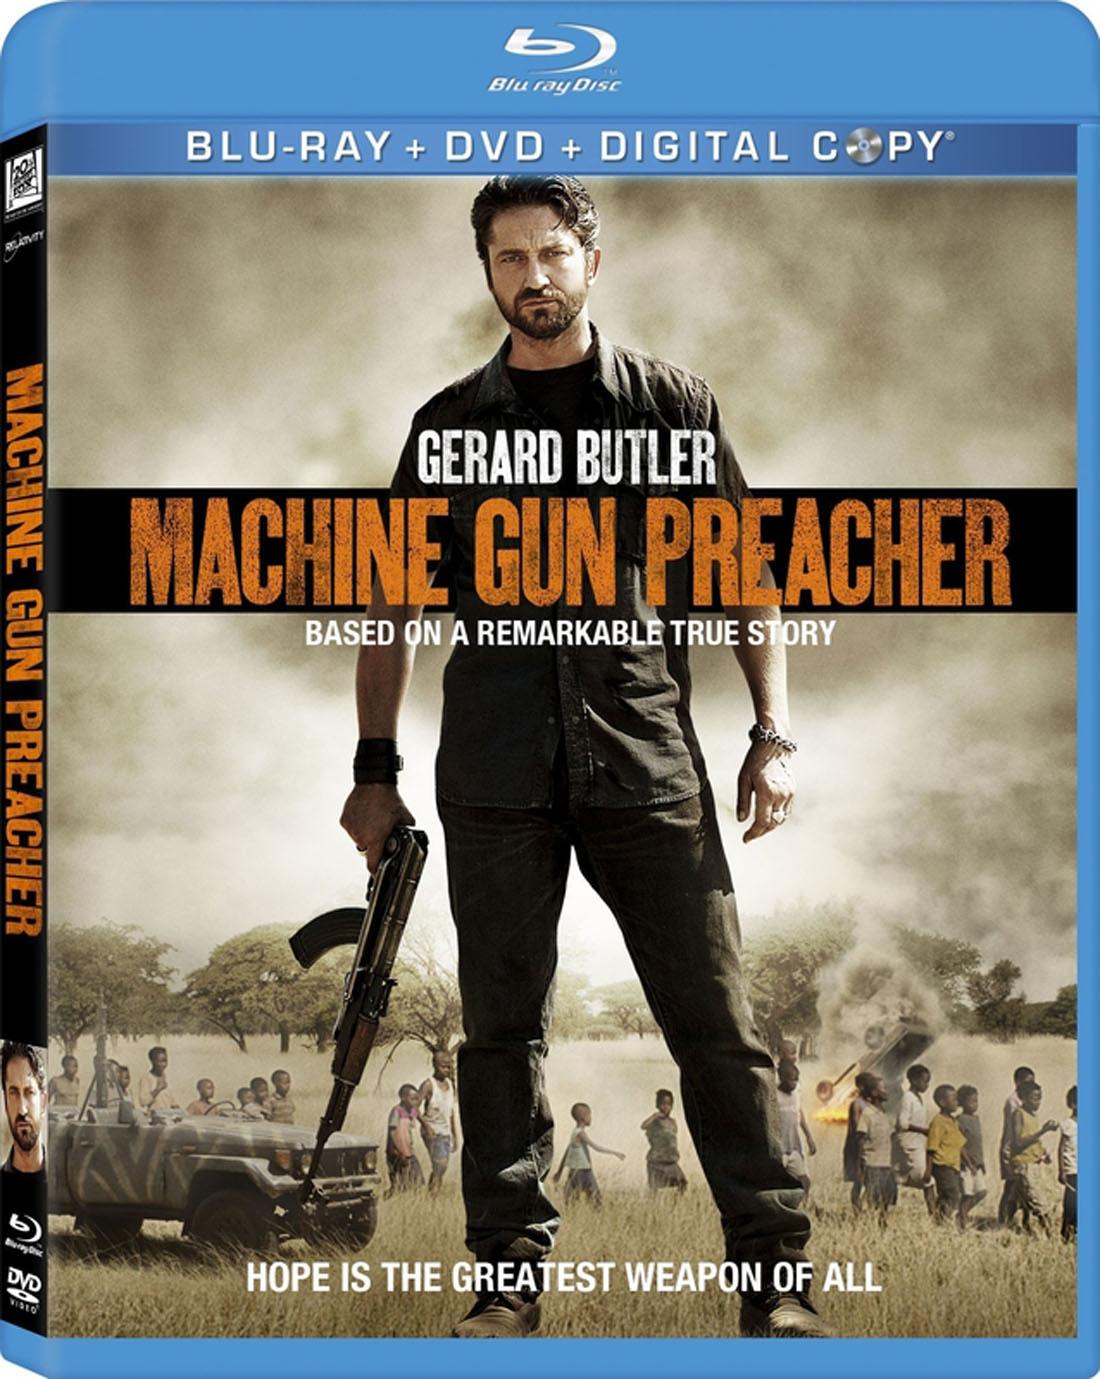 Machine Gun Preacher Blu-ray DVD Case Box